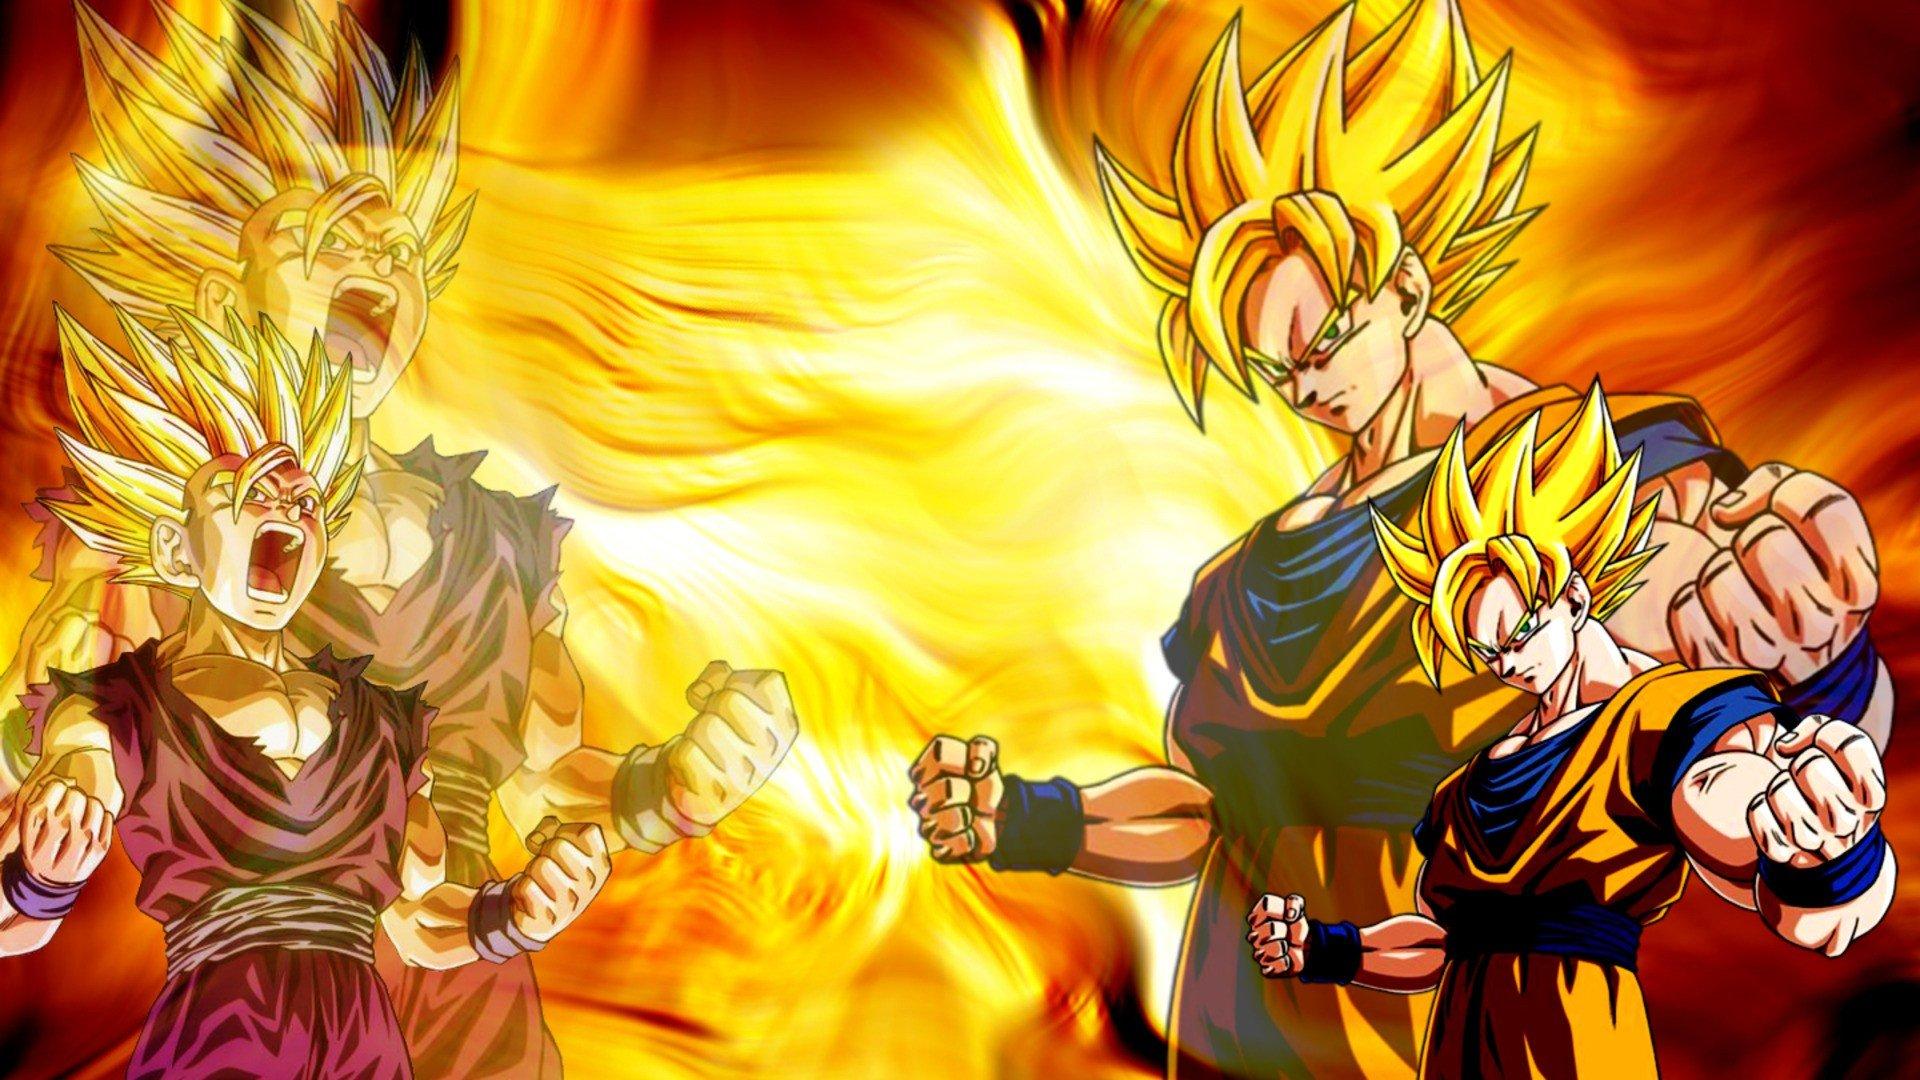 Wallpaper 1920x1080 Px Anime Dragon Ball Z Son Goku 1920x1080